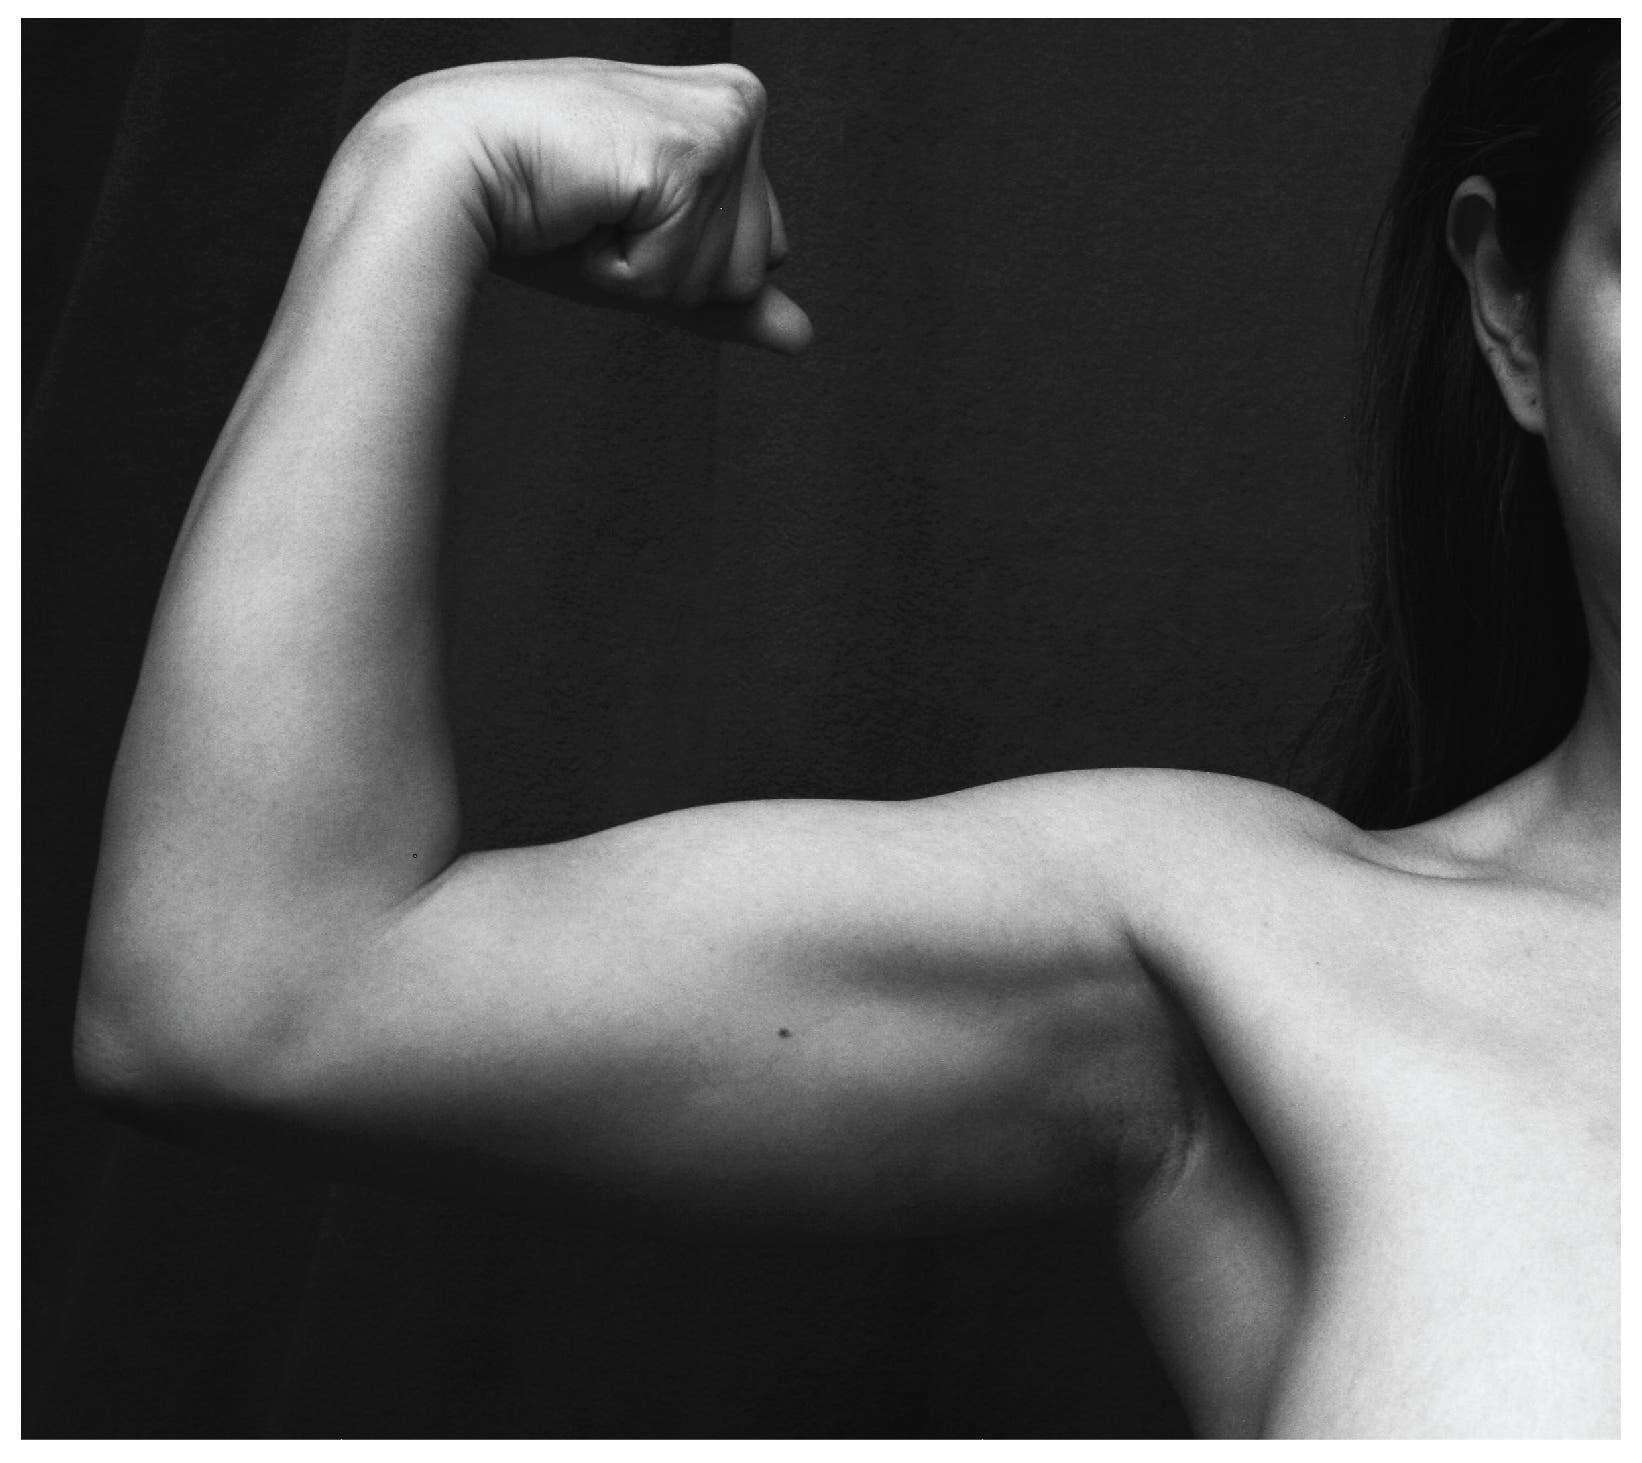 Biceps_Brachii_Muscle_Contraction.jpg